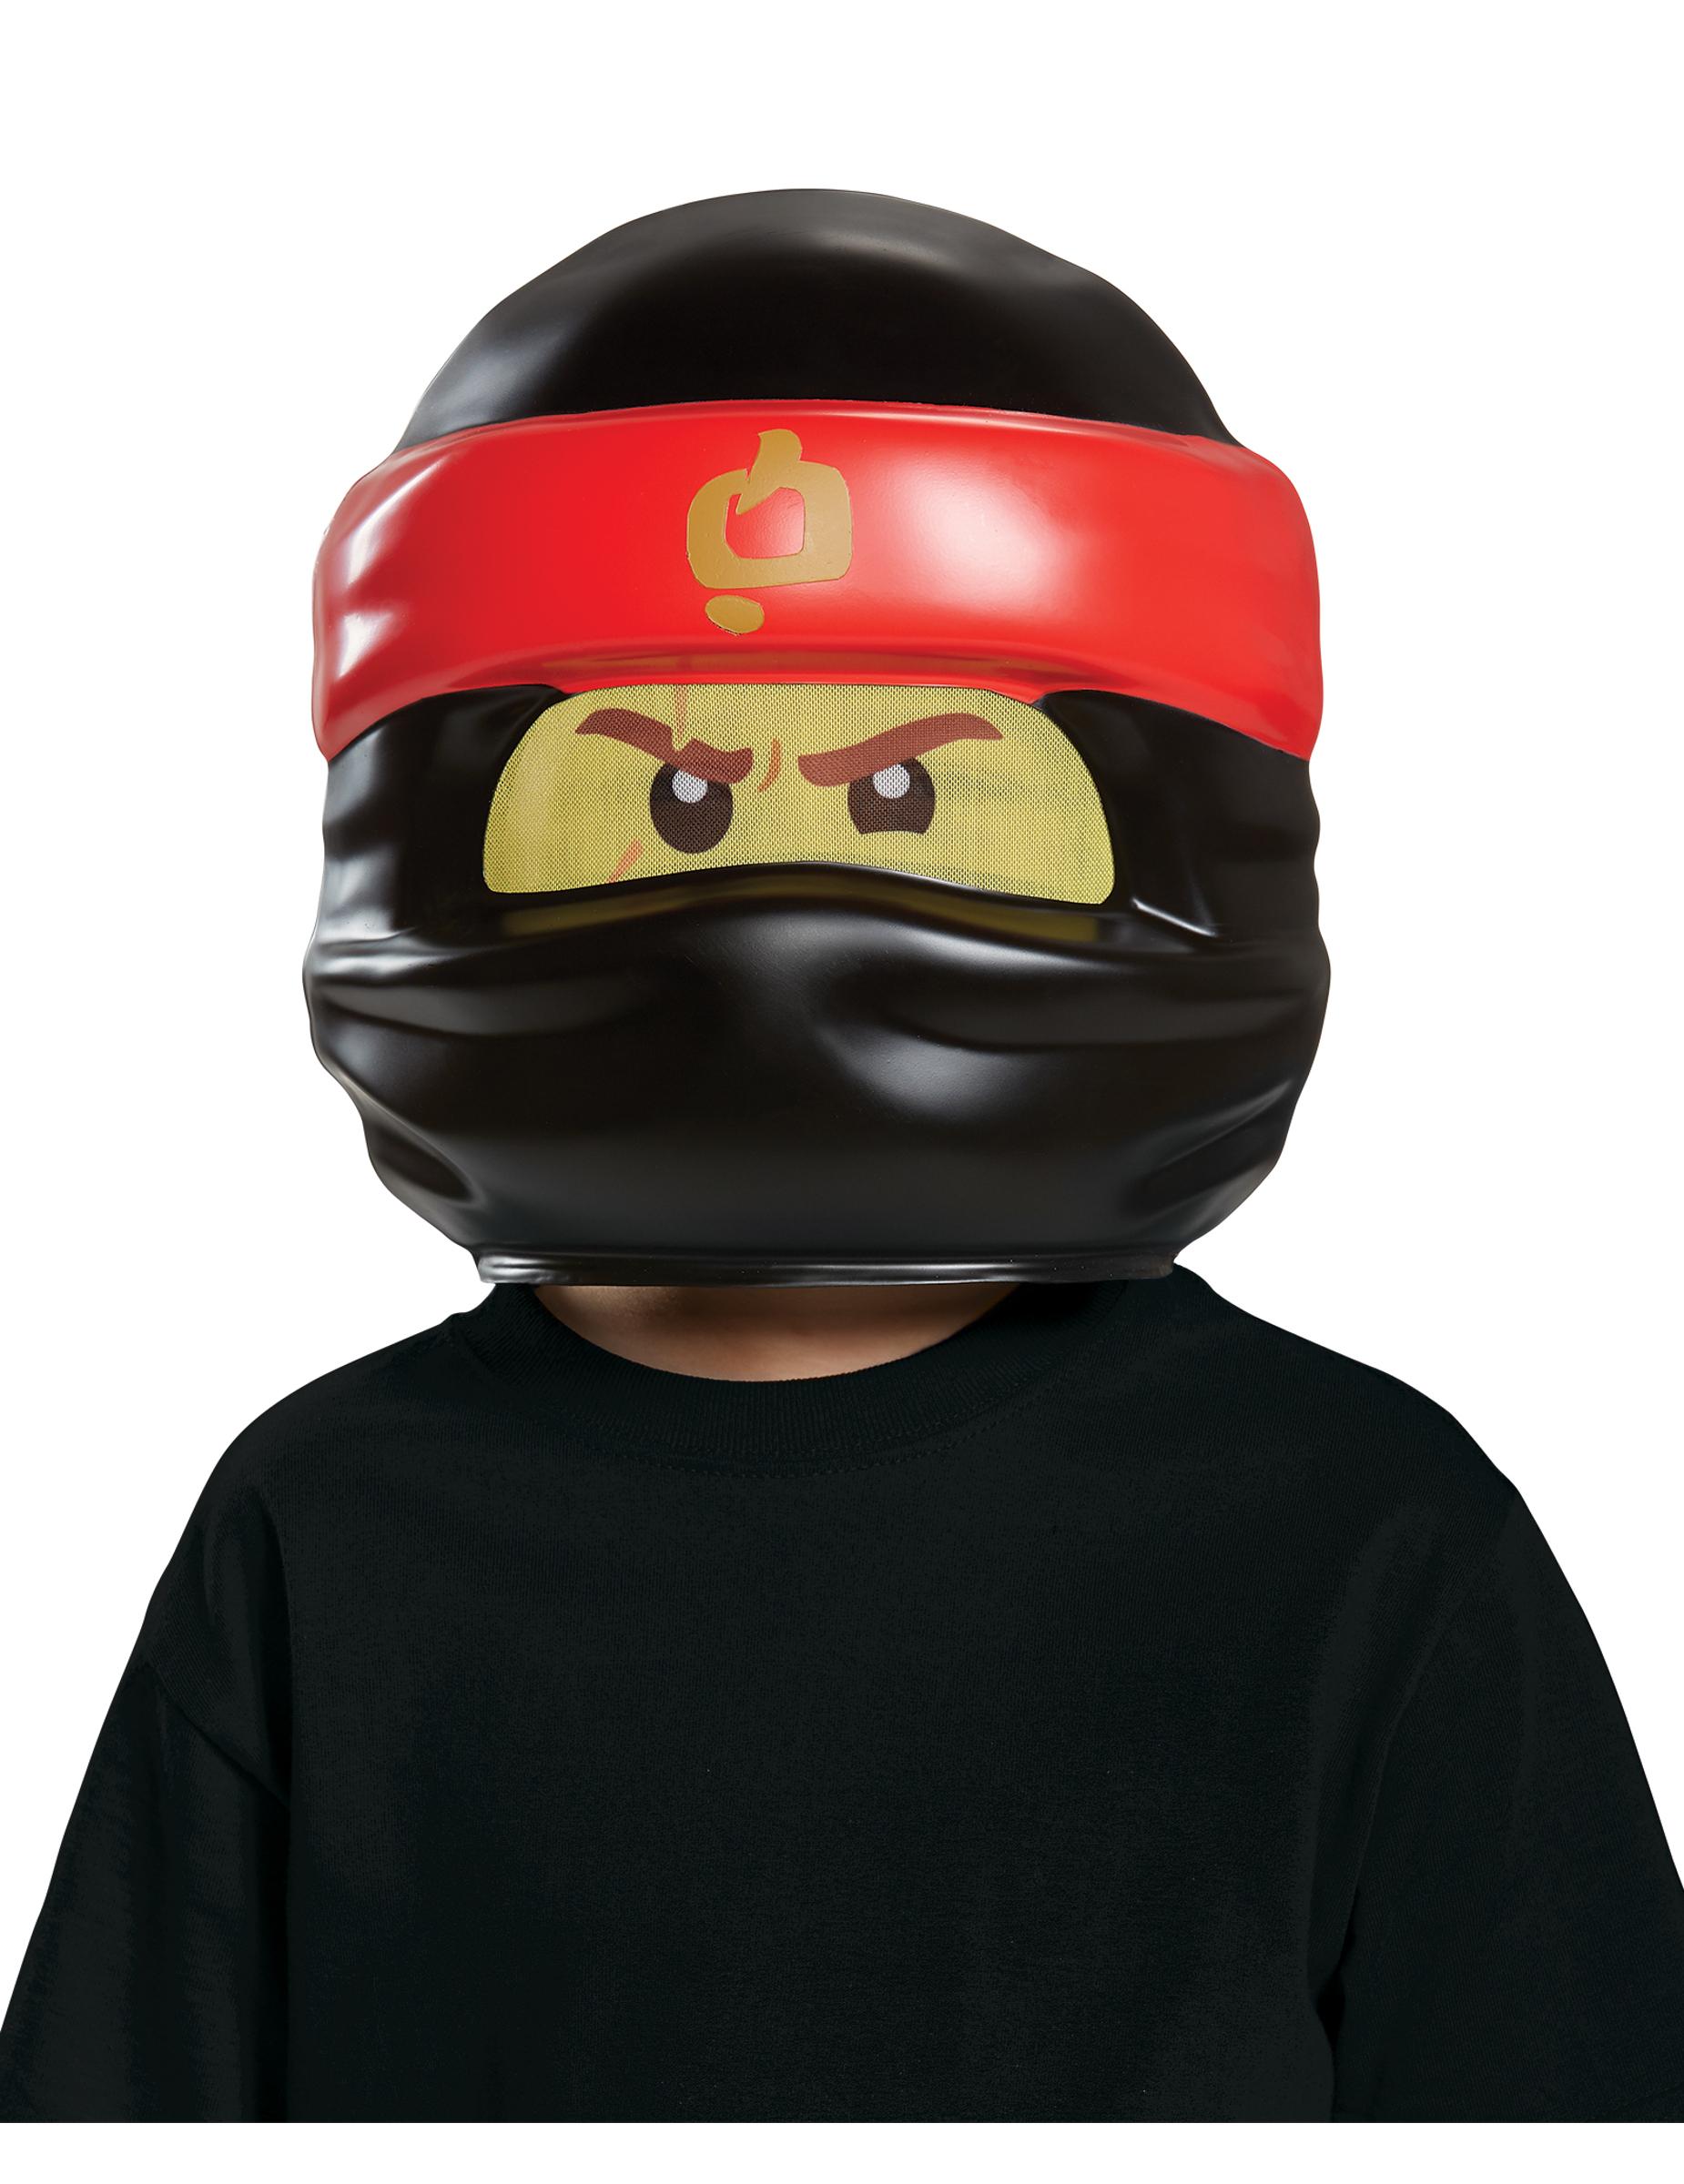 Kai Ninjago Maske für Kinder - The Lego Ninjago Movie 270748